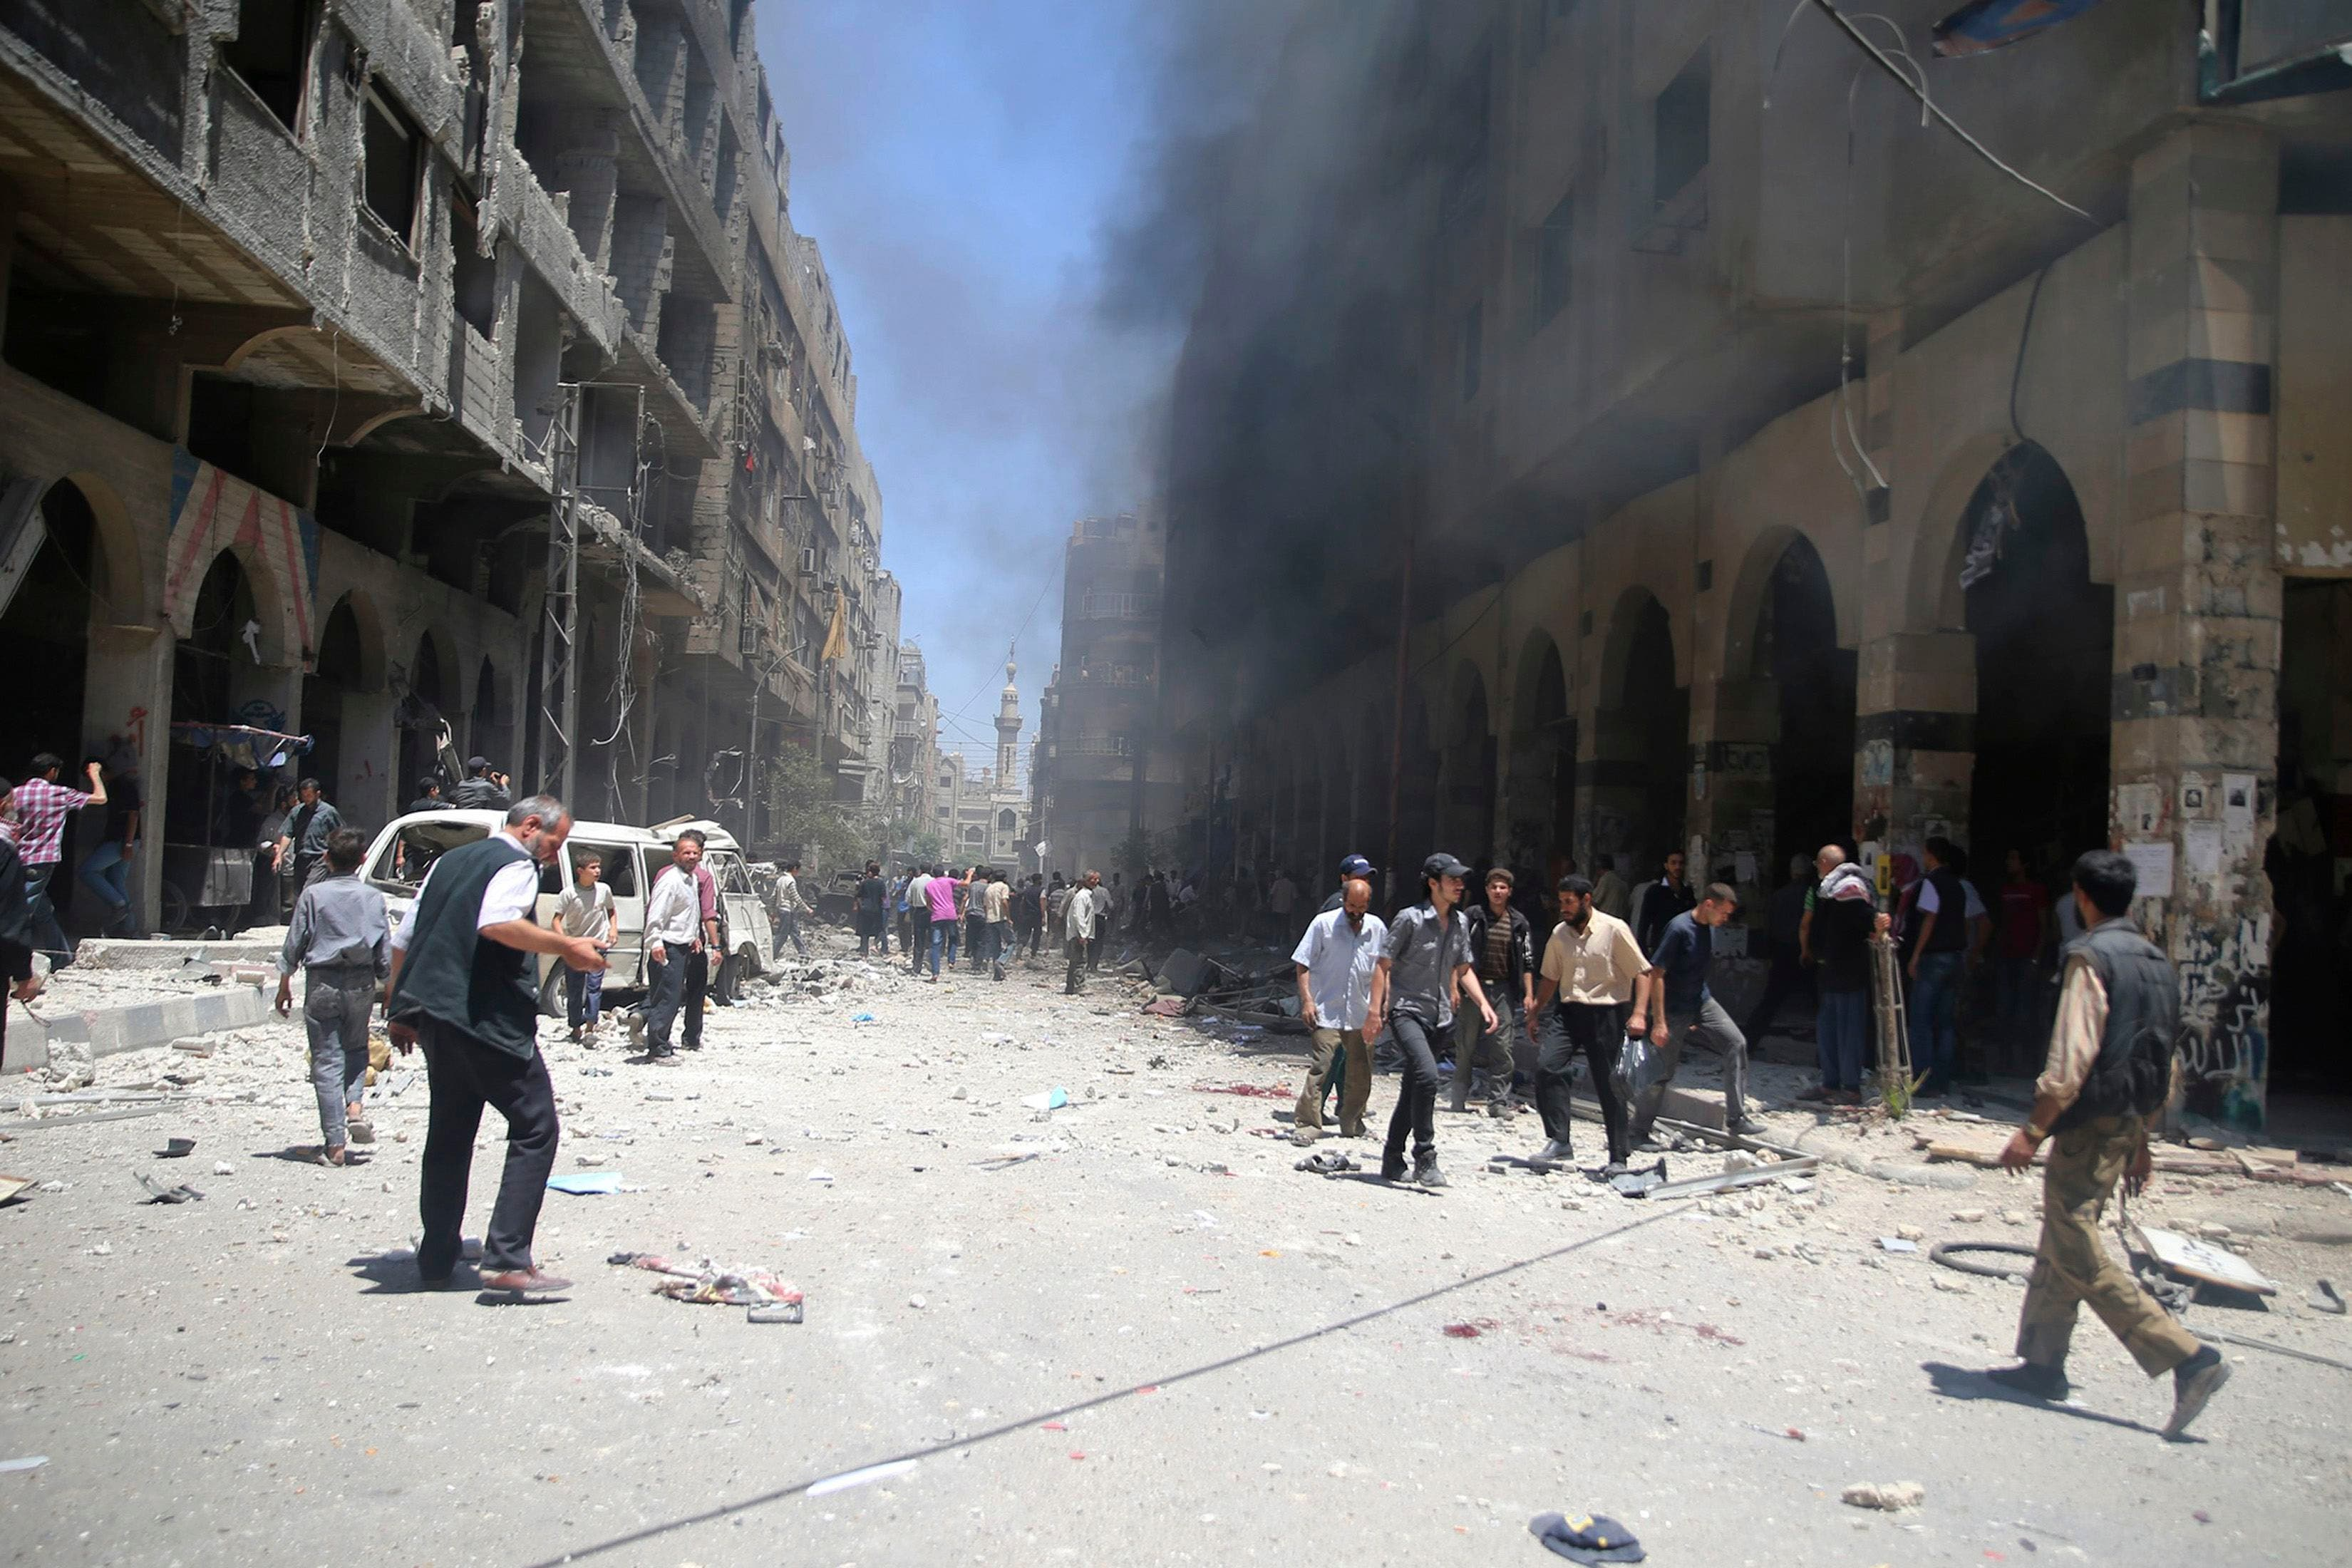 من قصف سابق على ريف دمشق